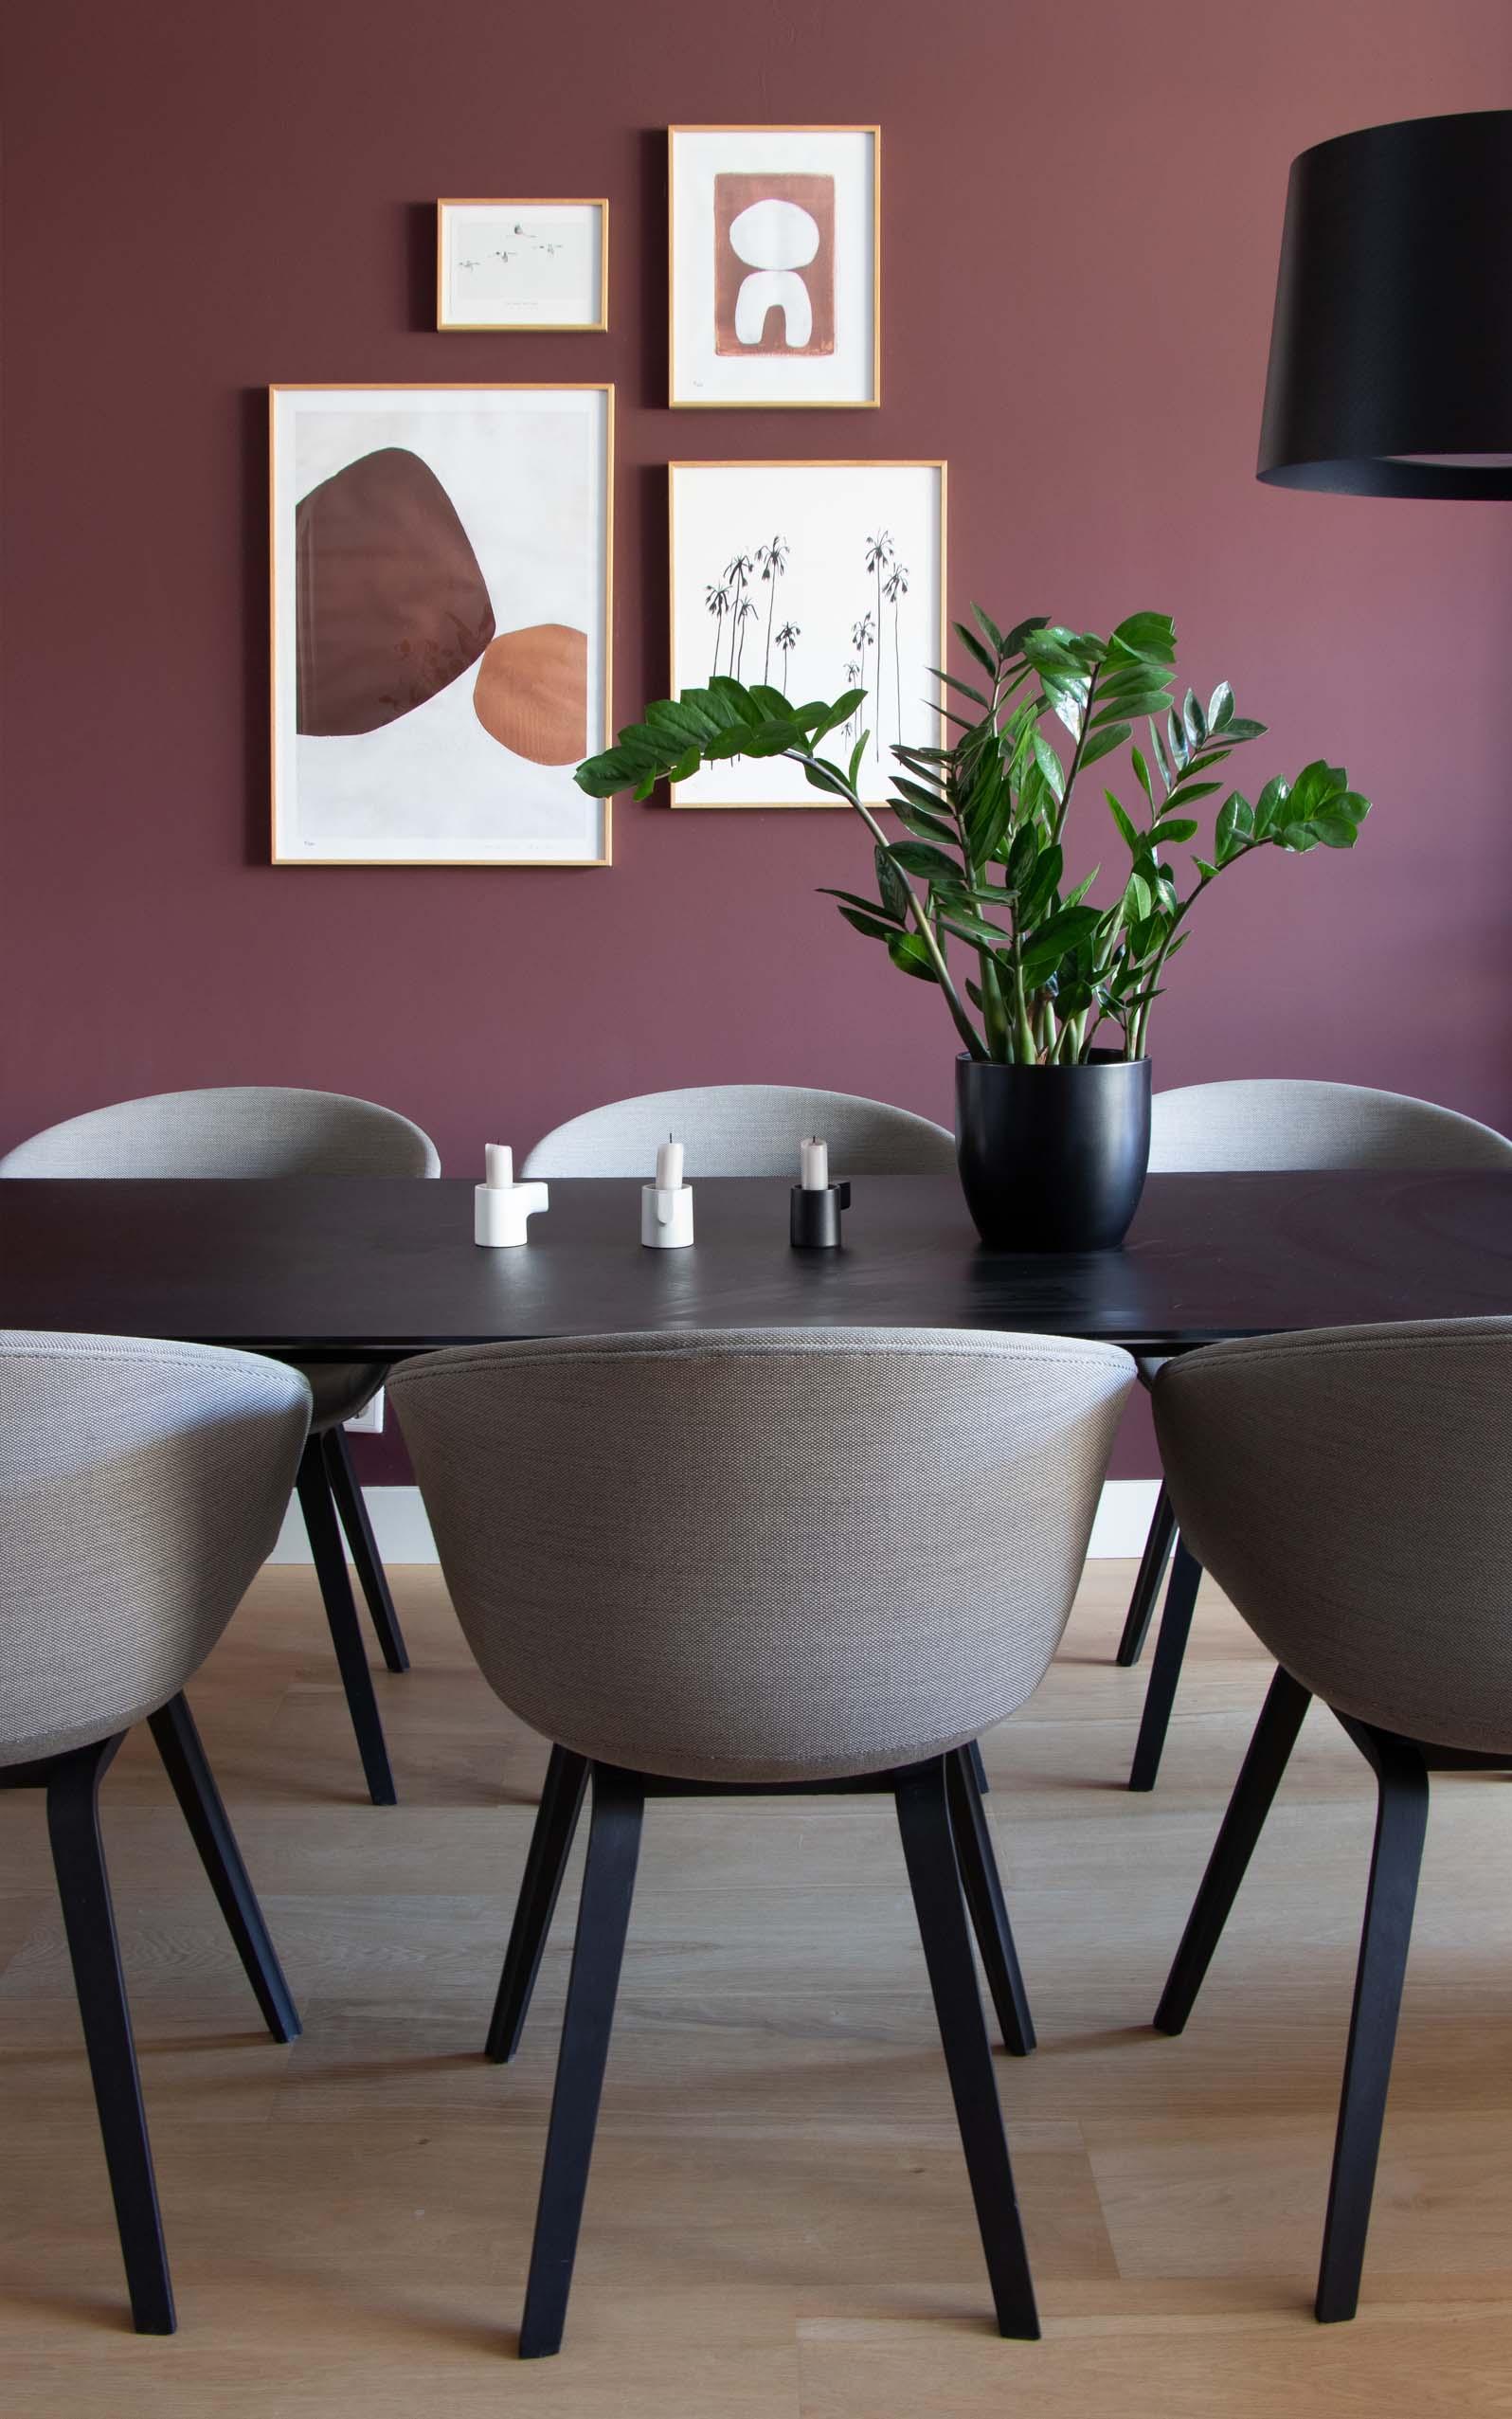 Zamioculcas makkelijke sterke kamerplant